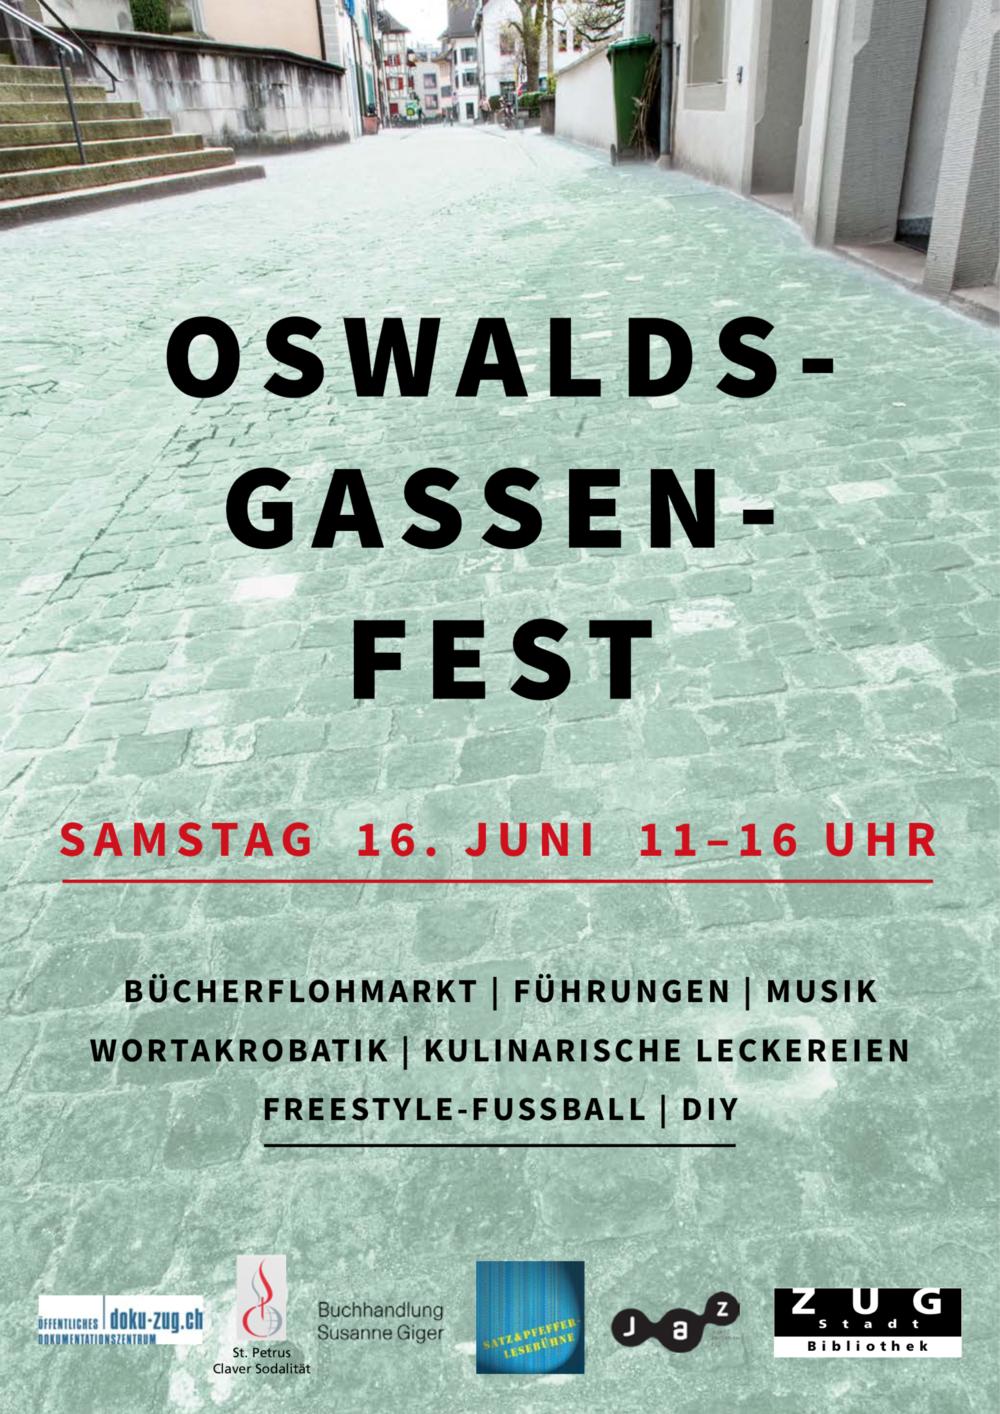 Oswalds-Gassen-Fest 2018.png